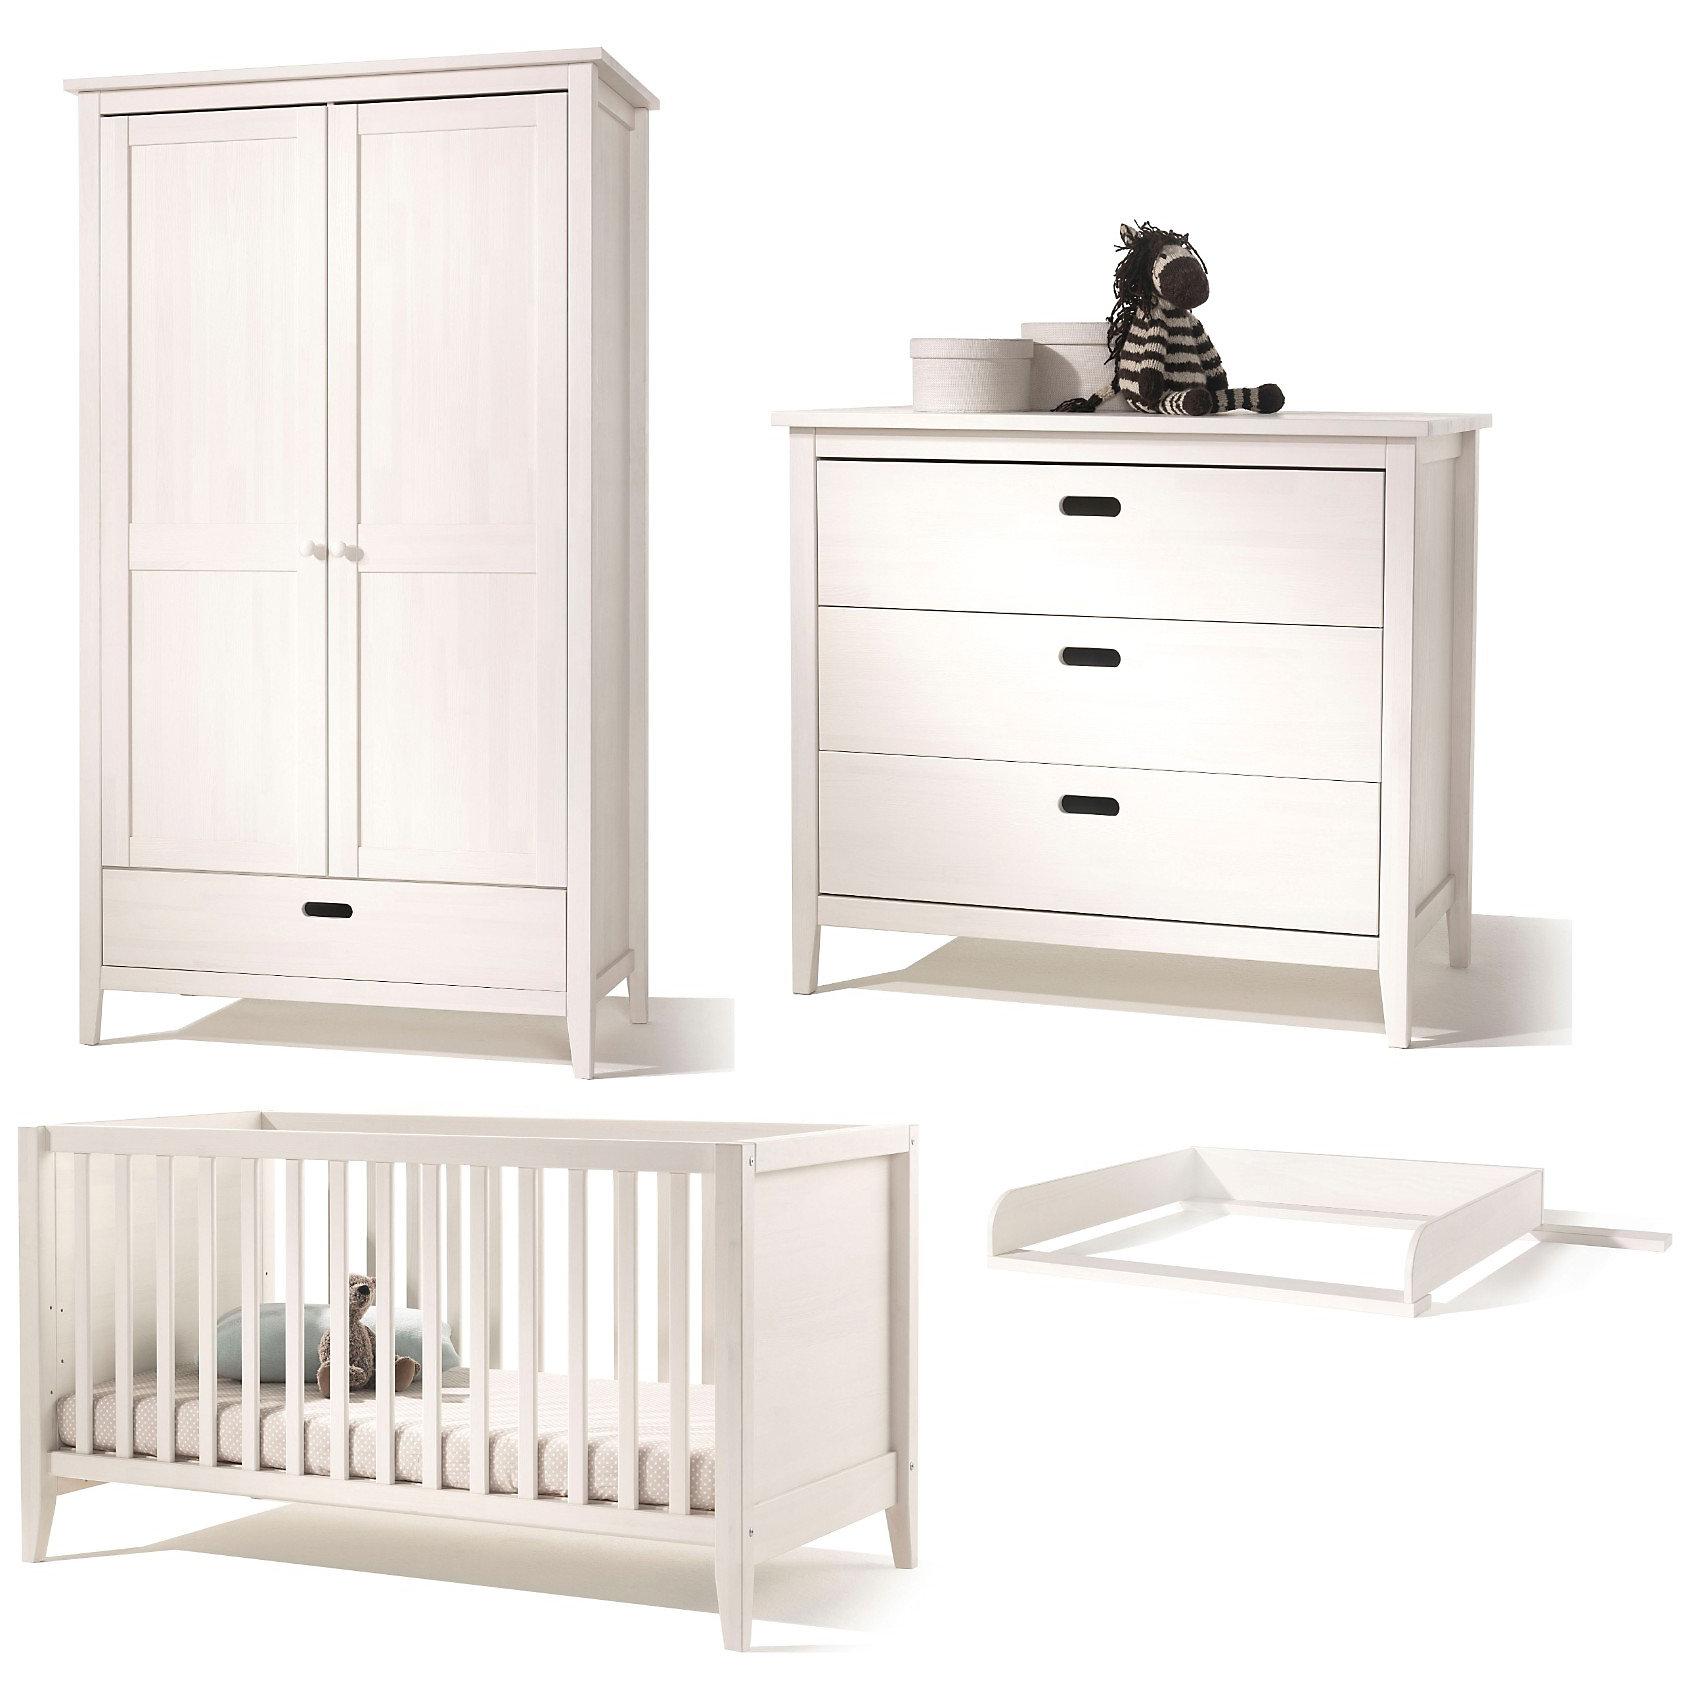 preisvergleich eu kleiderschrank kiefer massiv weiss. Black Bedroom Furniture Sets. Home Design Ideas